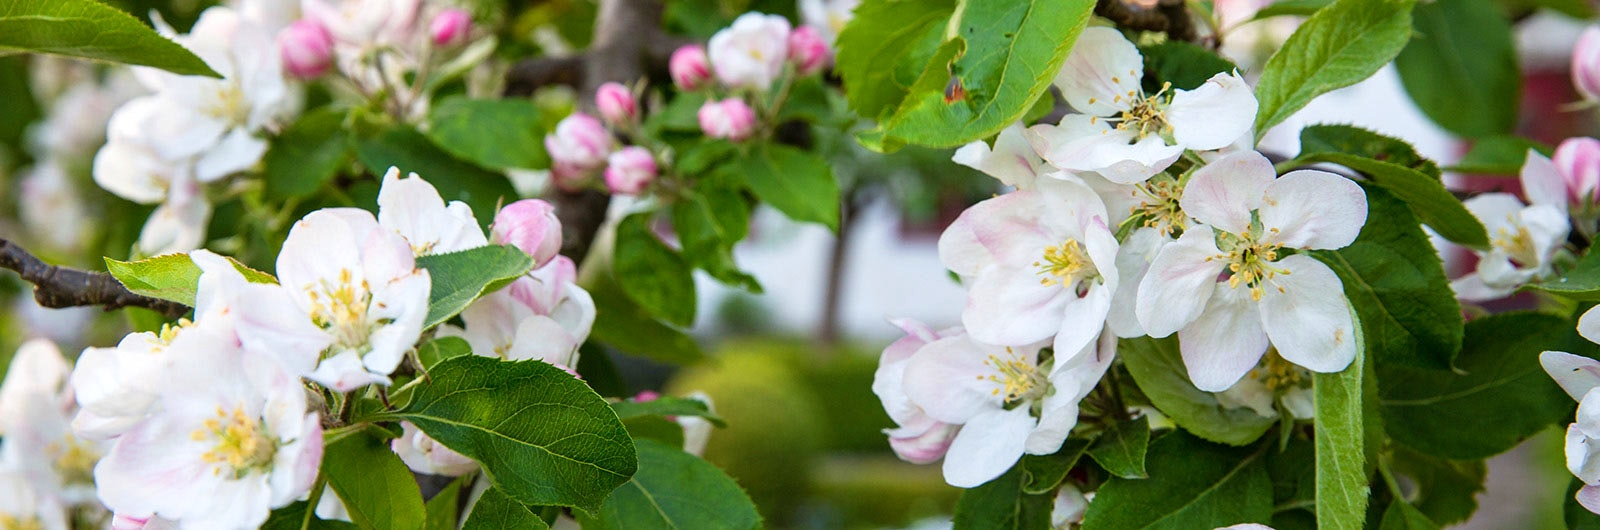 Rosavita blommor i närbild